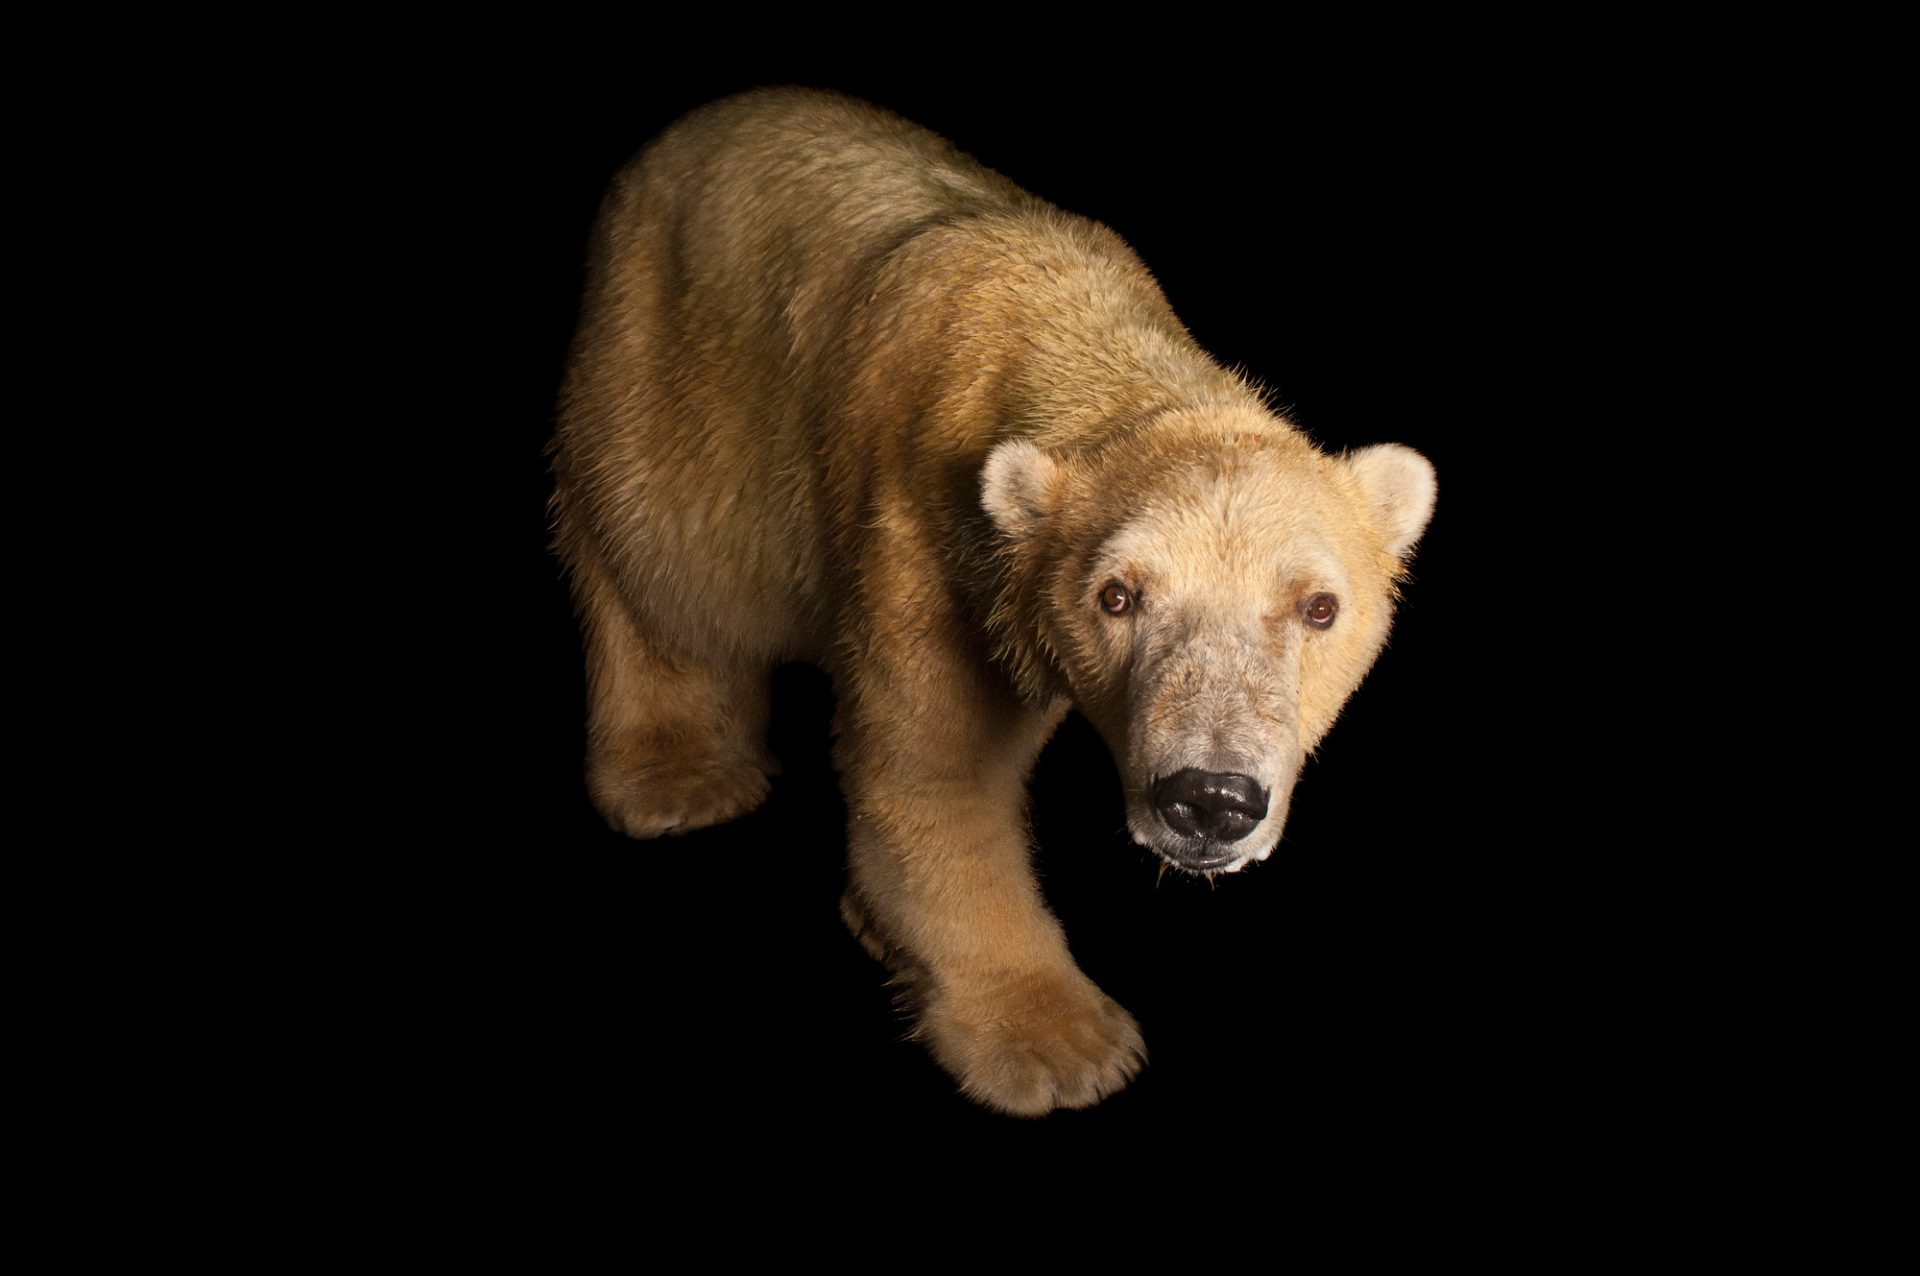 A vulnerable (IUCN) and federally threatened polar bear (Ursus maritimus) at the Tulsa Zoo.